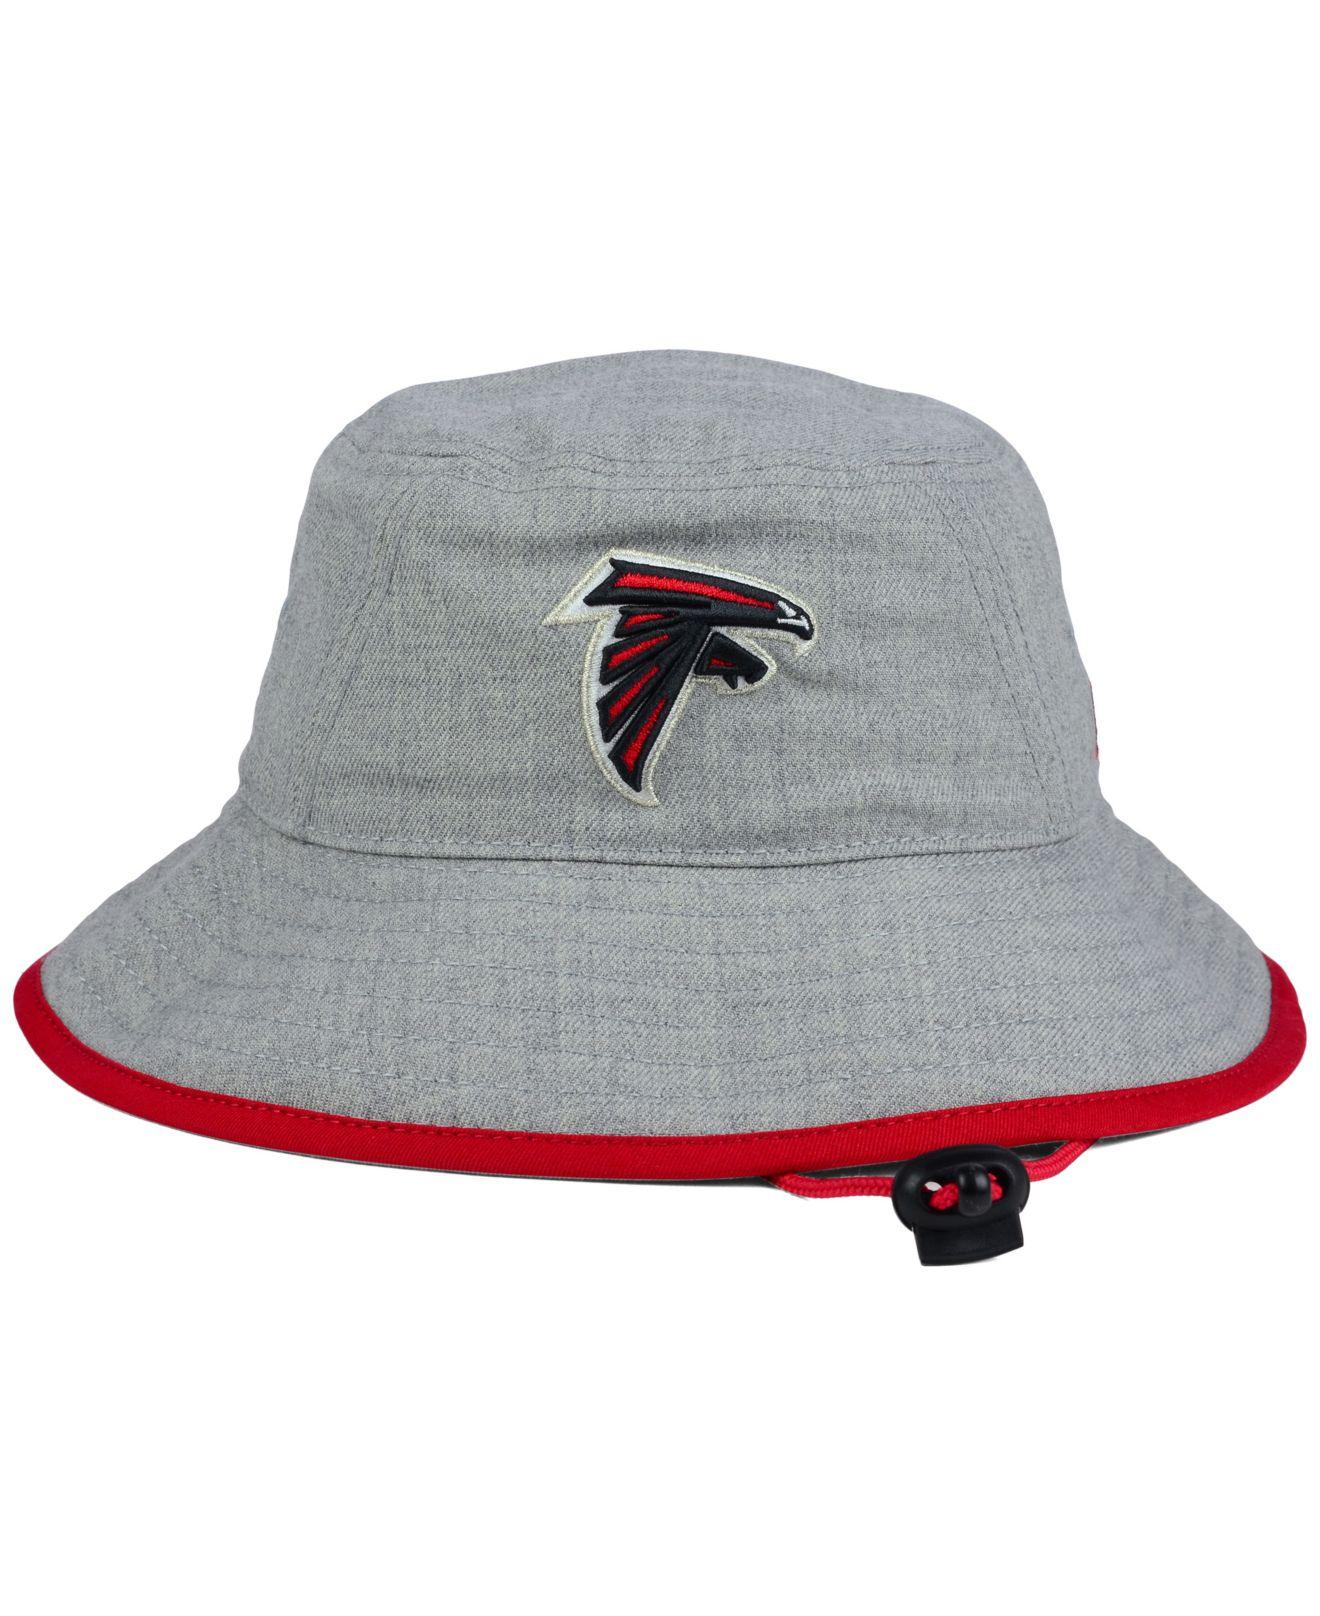 Lyst Ktz Atlanta Falcons Nfl Heather Gray Bucket Hat In For Men 1c866b9878fe